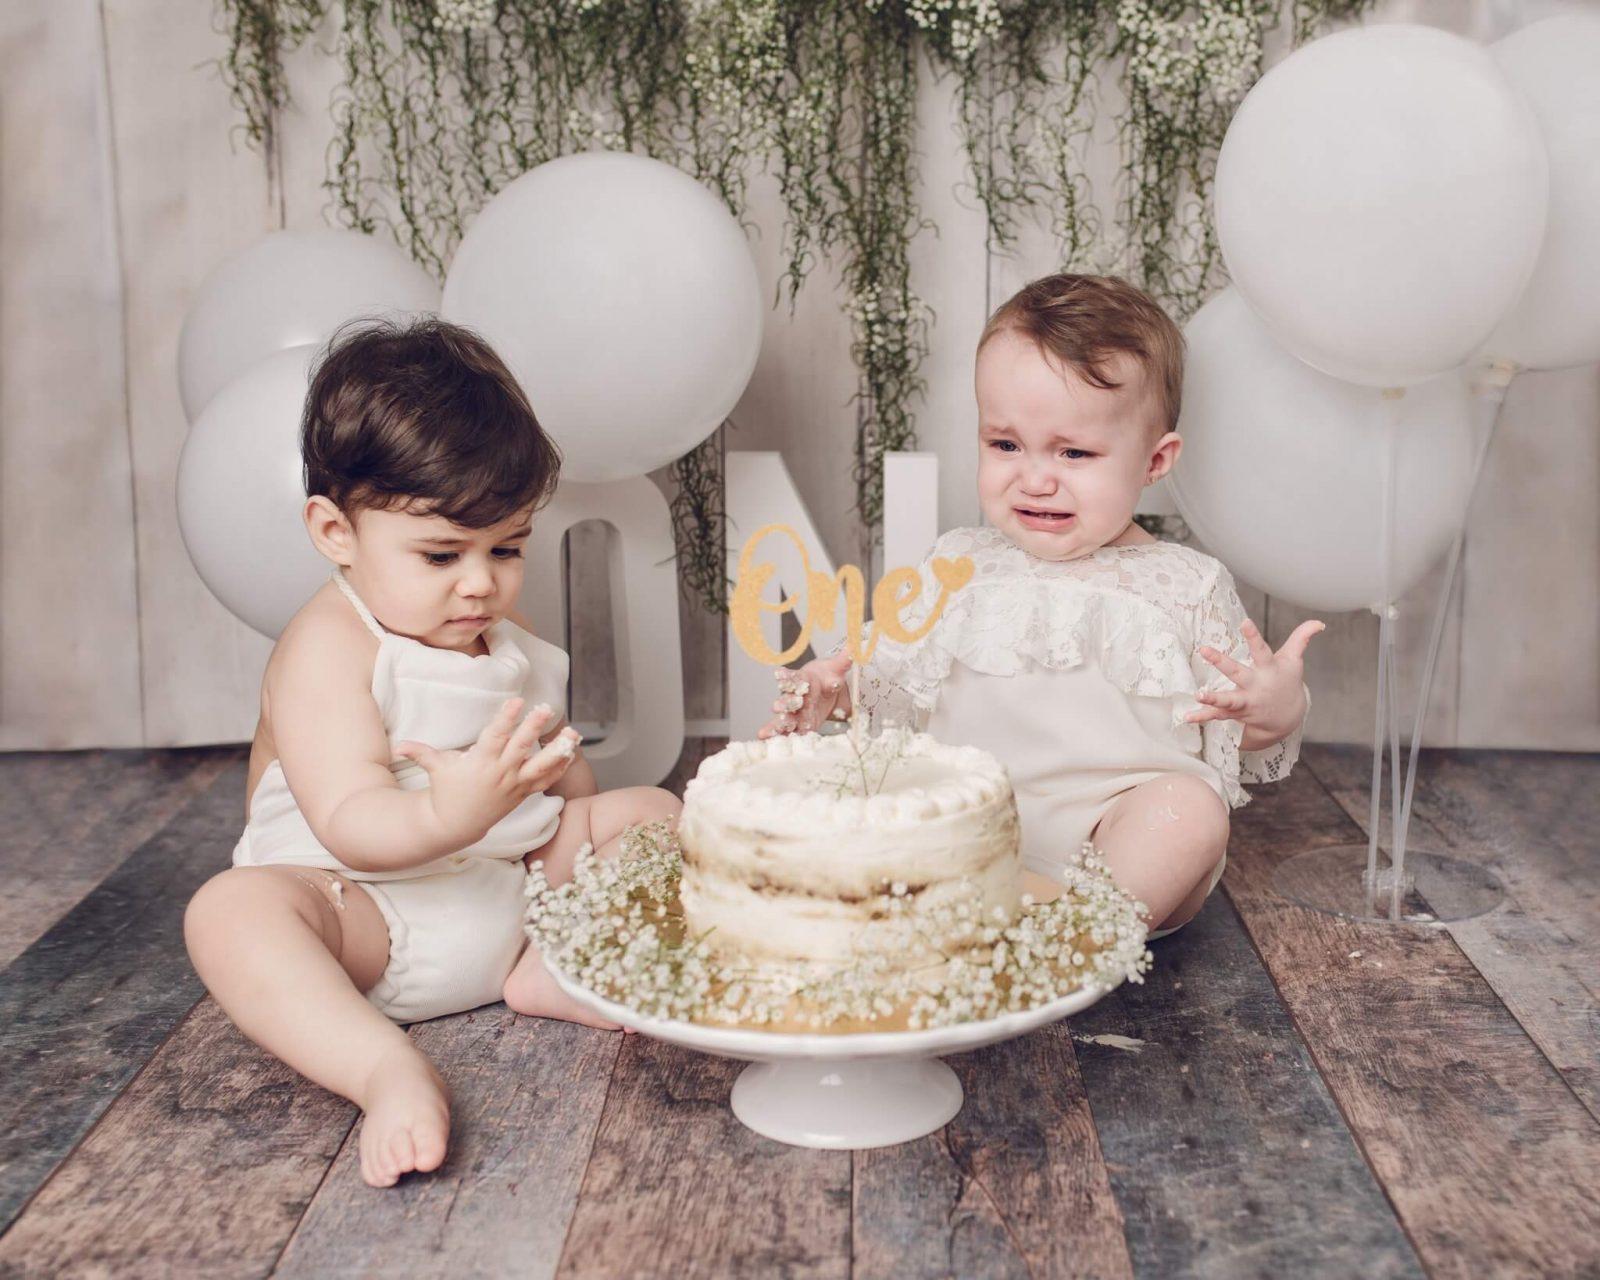 Cake smash photography in London